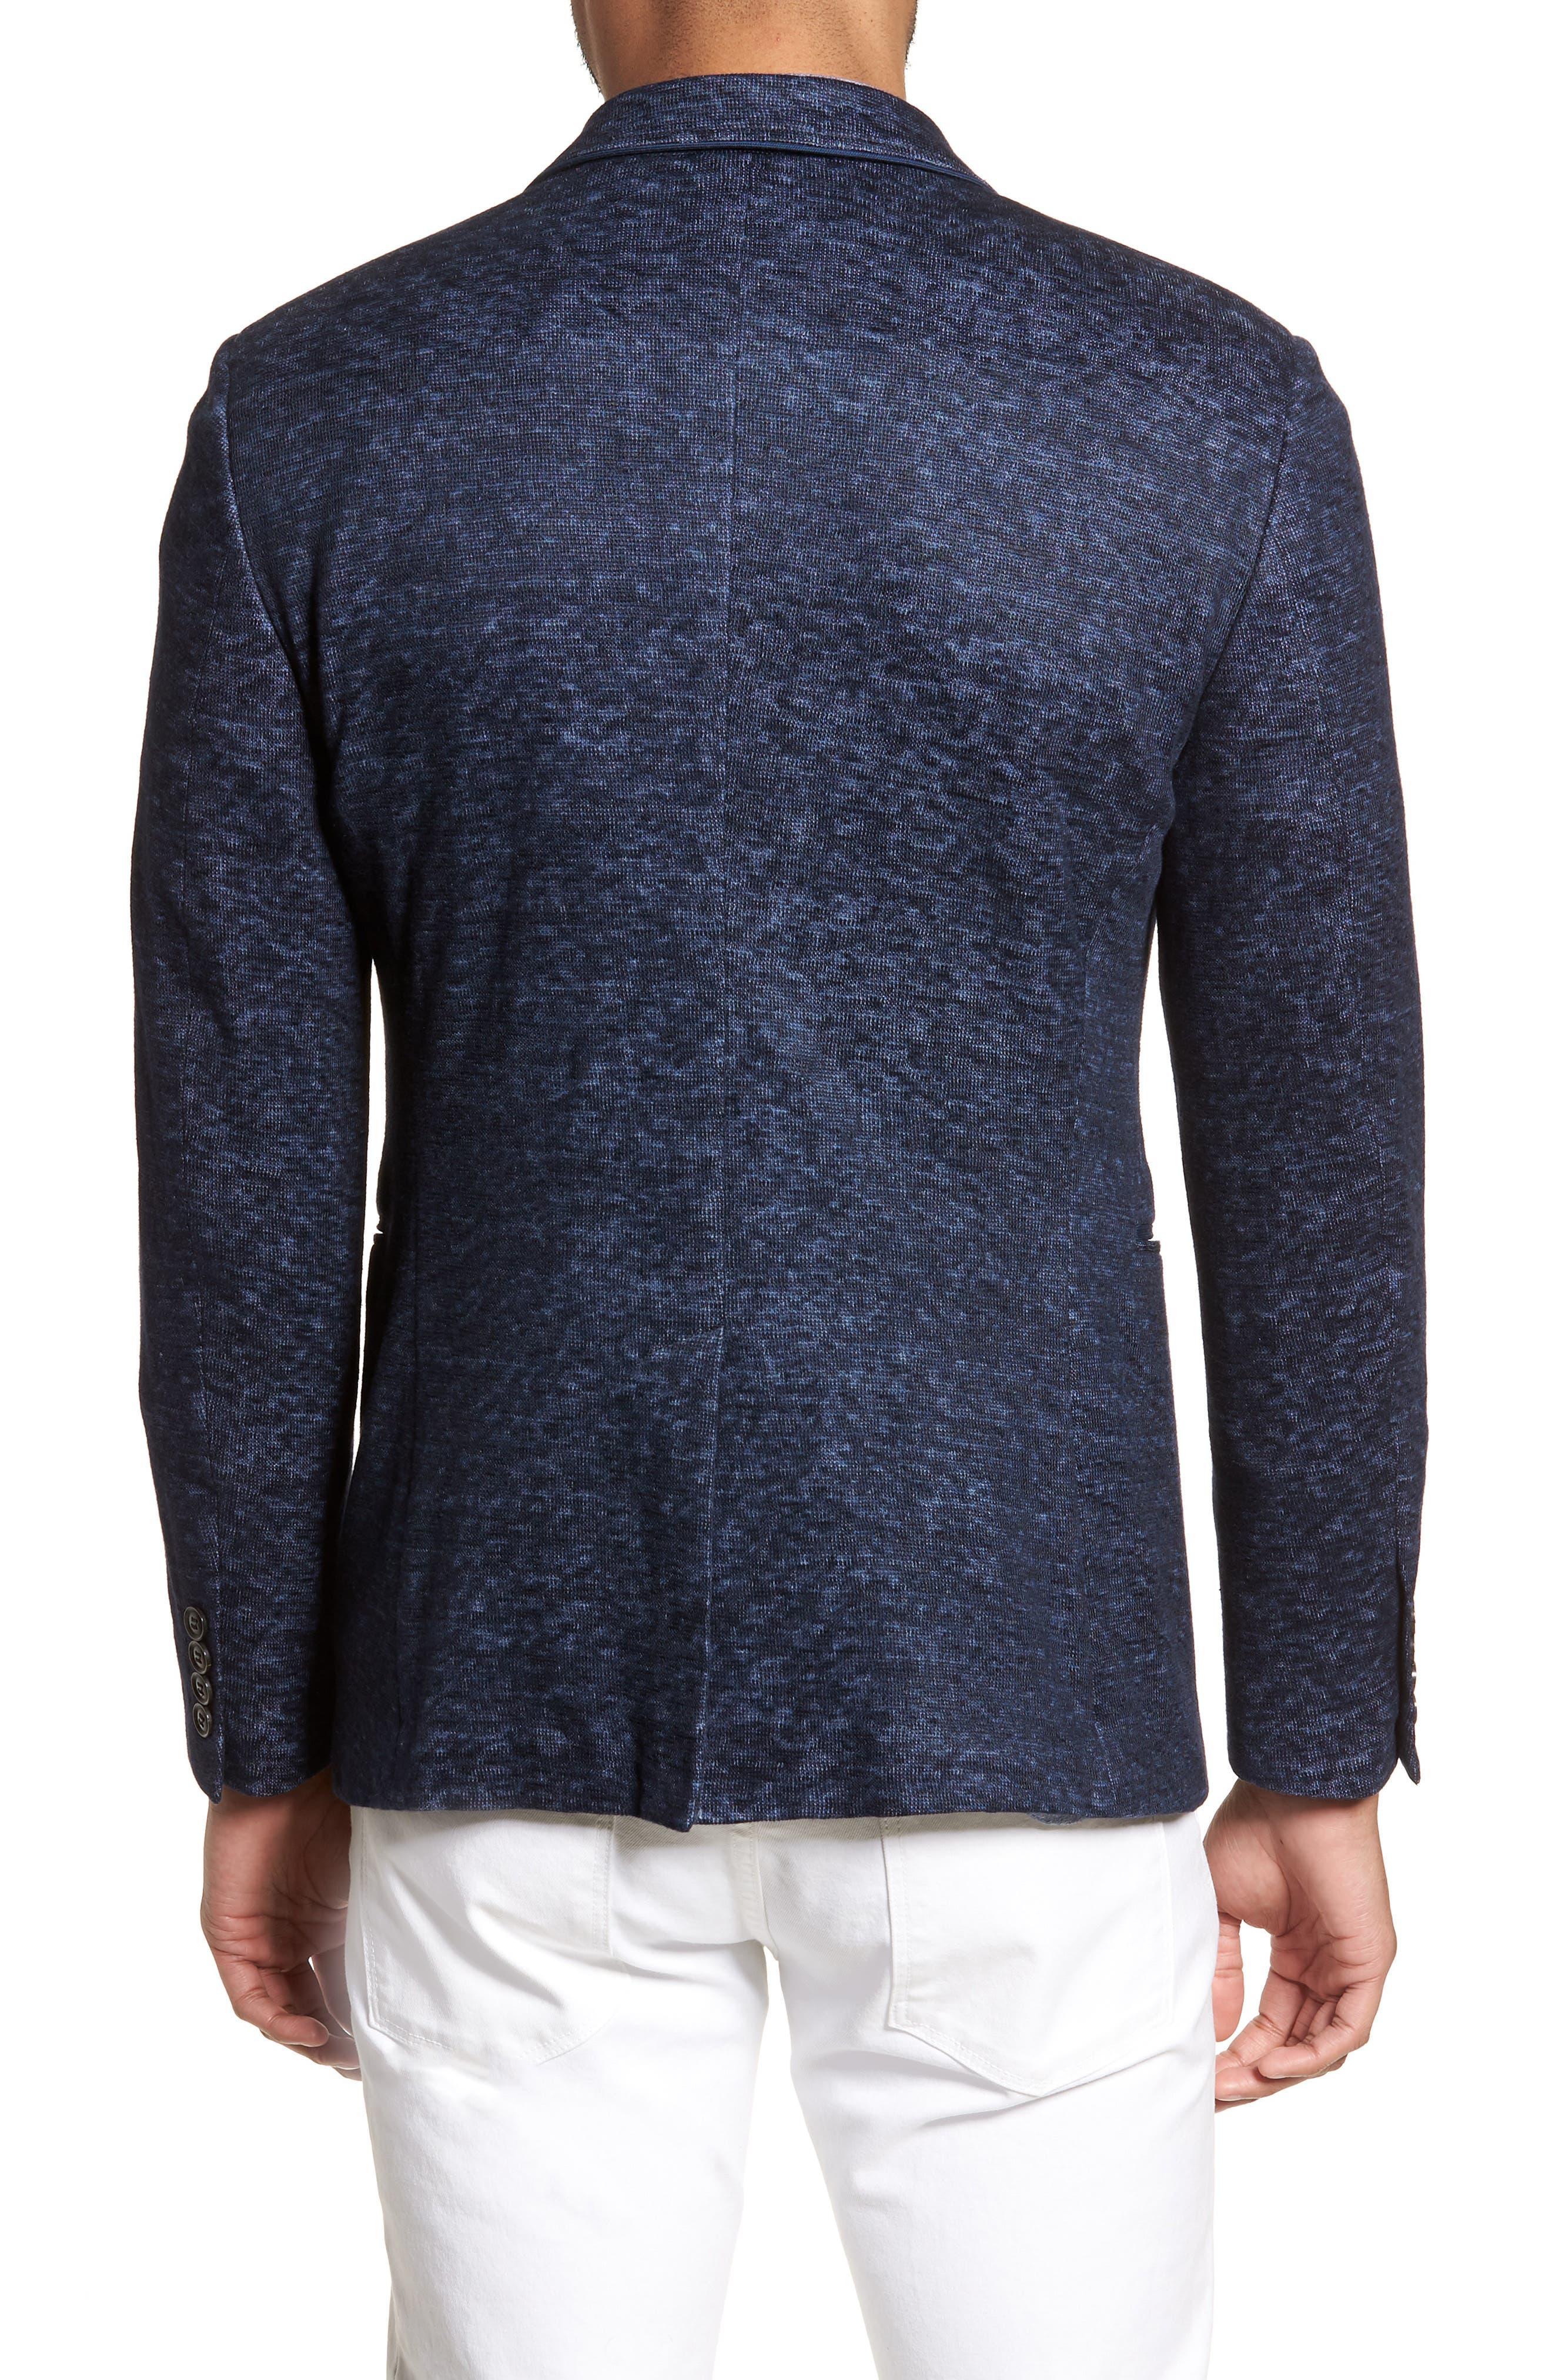 Regular Fit Cotton & Linen Blazer,                             Alternate thumbnail 2, color,                             406